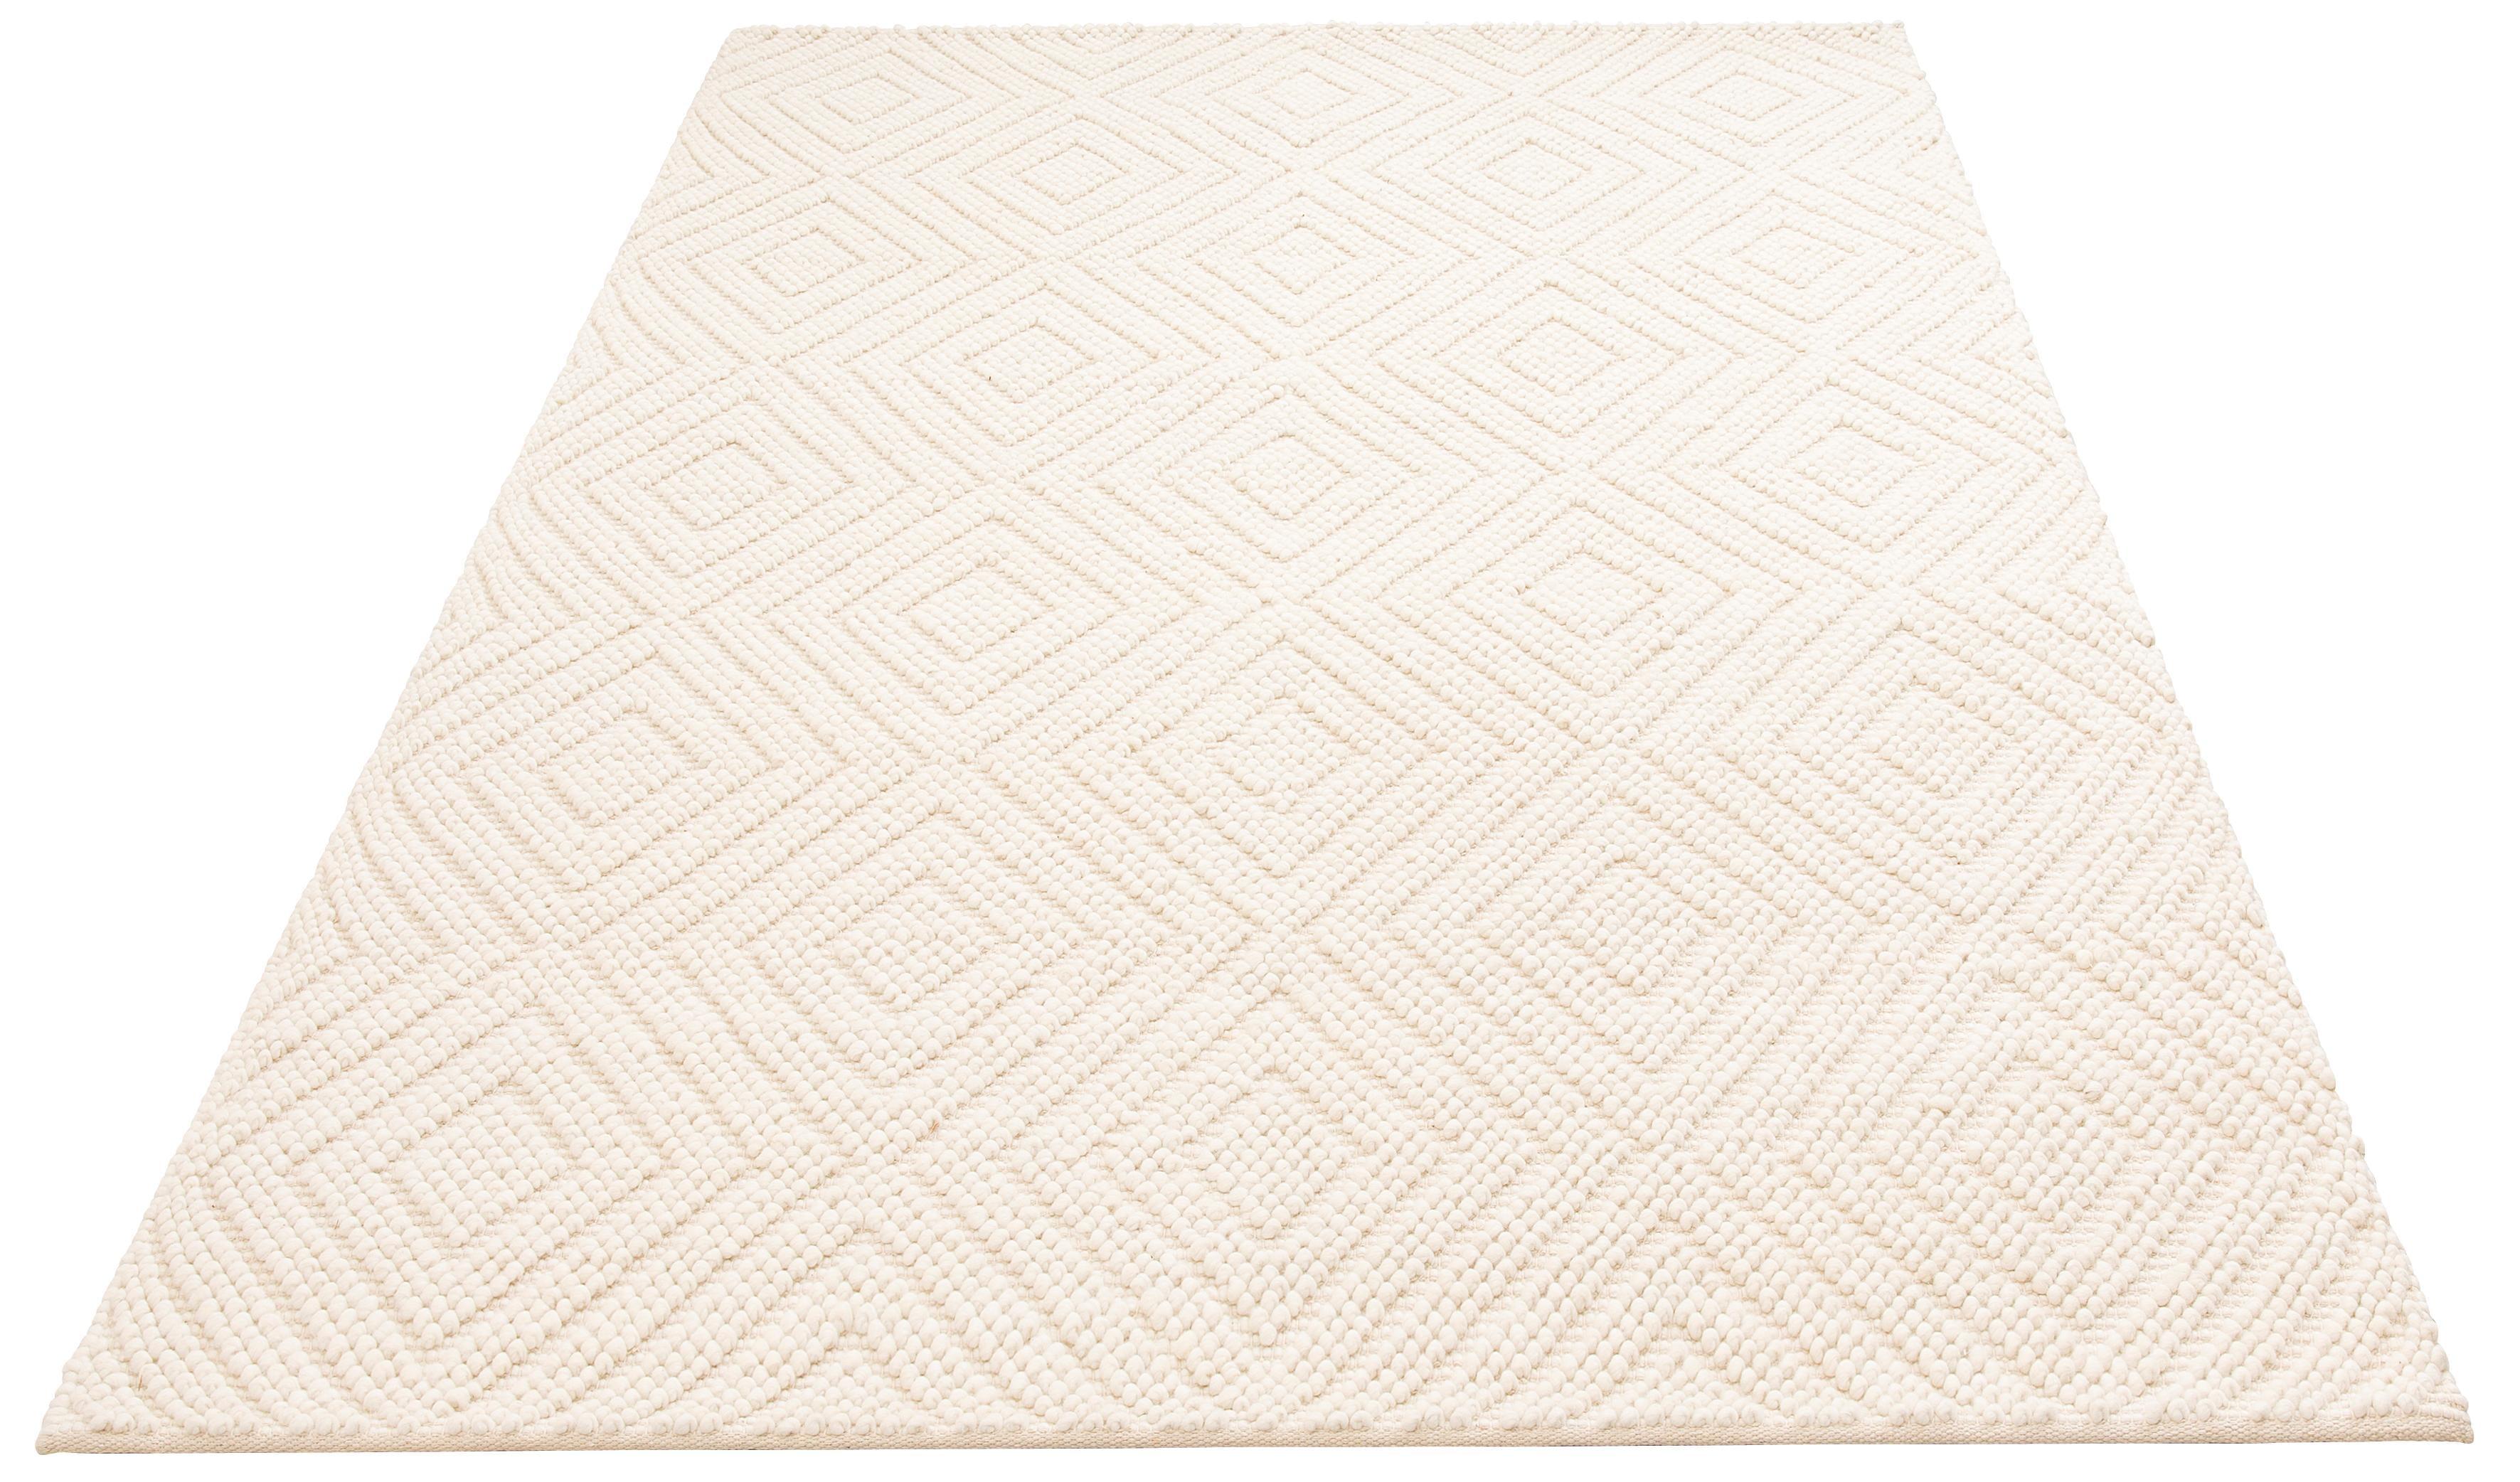 Teppich elbflunder elbgestoeber rechteckig Höhe 8 mm handgewebt